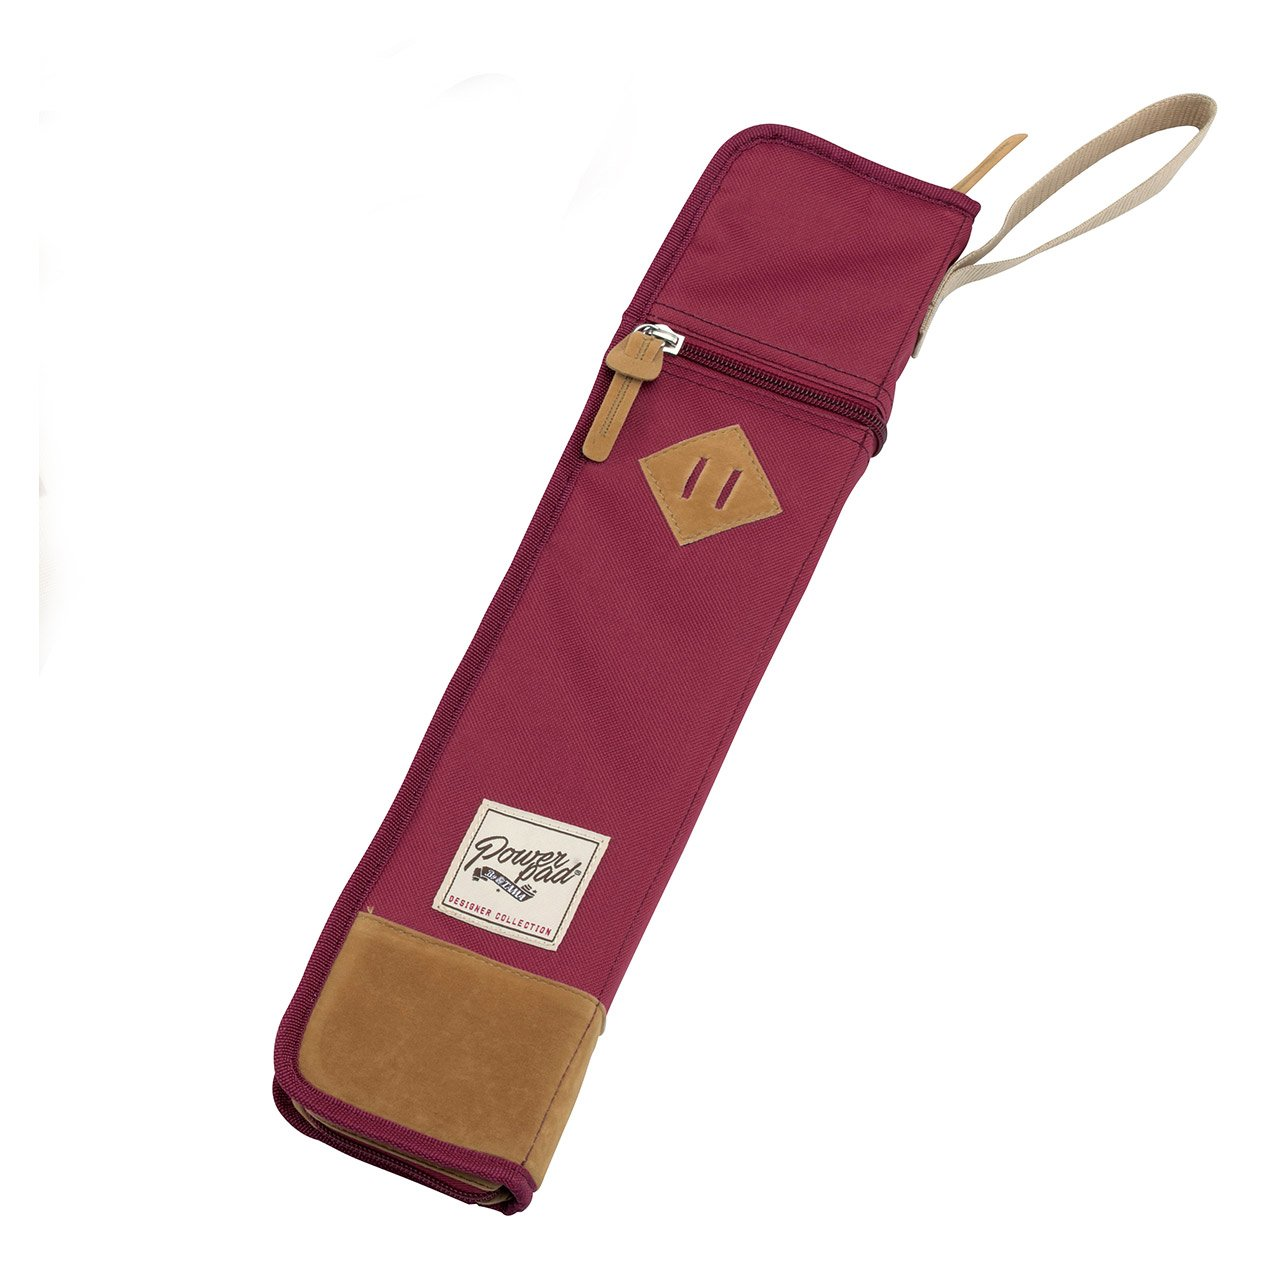 Tama TSB12WR Powerpad Drumstick Bag, Wine Red